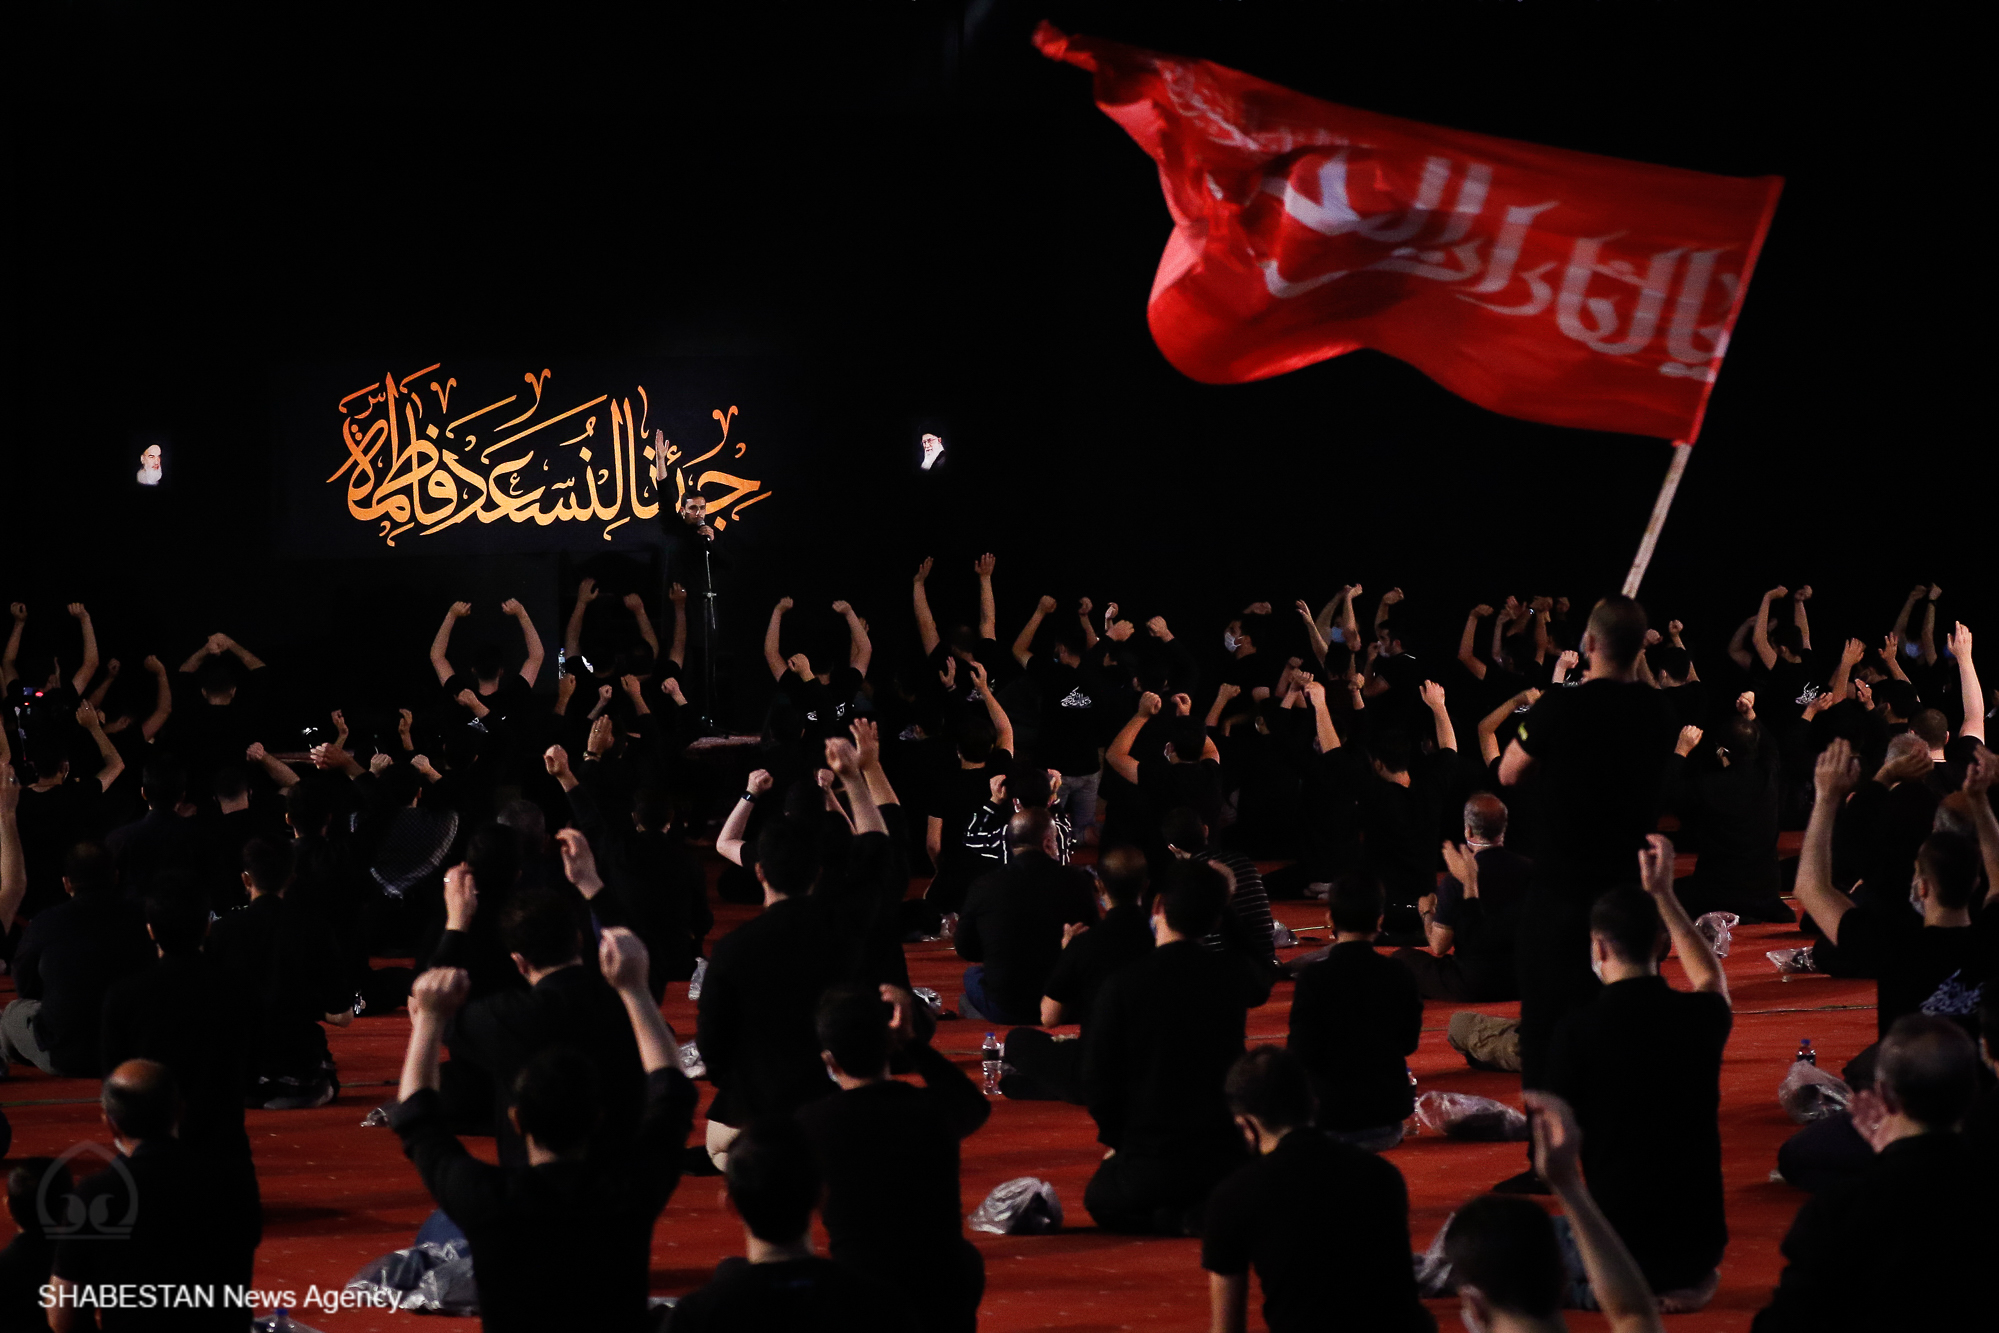 عزاداري امام حسين (ع) تا ظهور امام مهدي (عج) ادامه دارد +فیلم